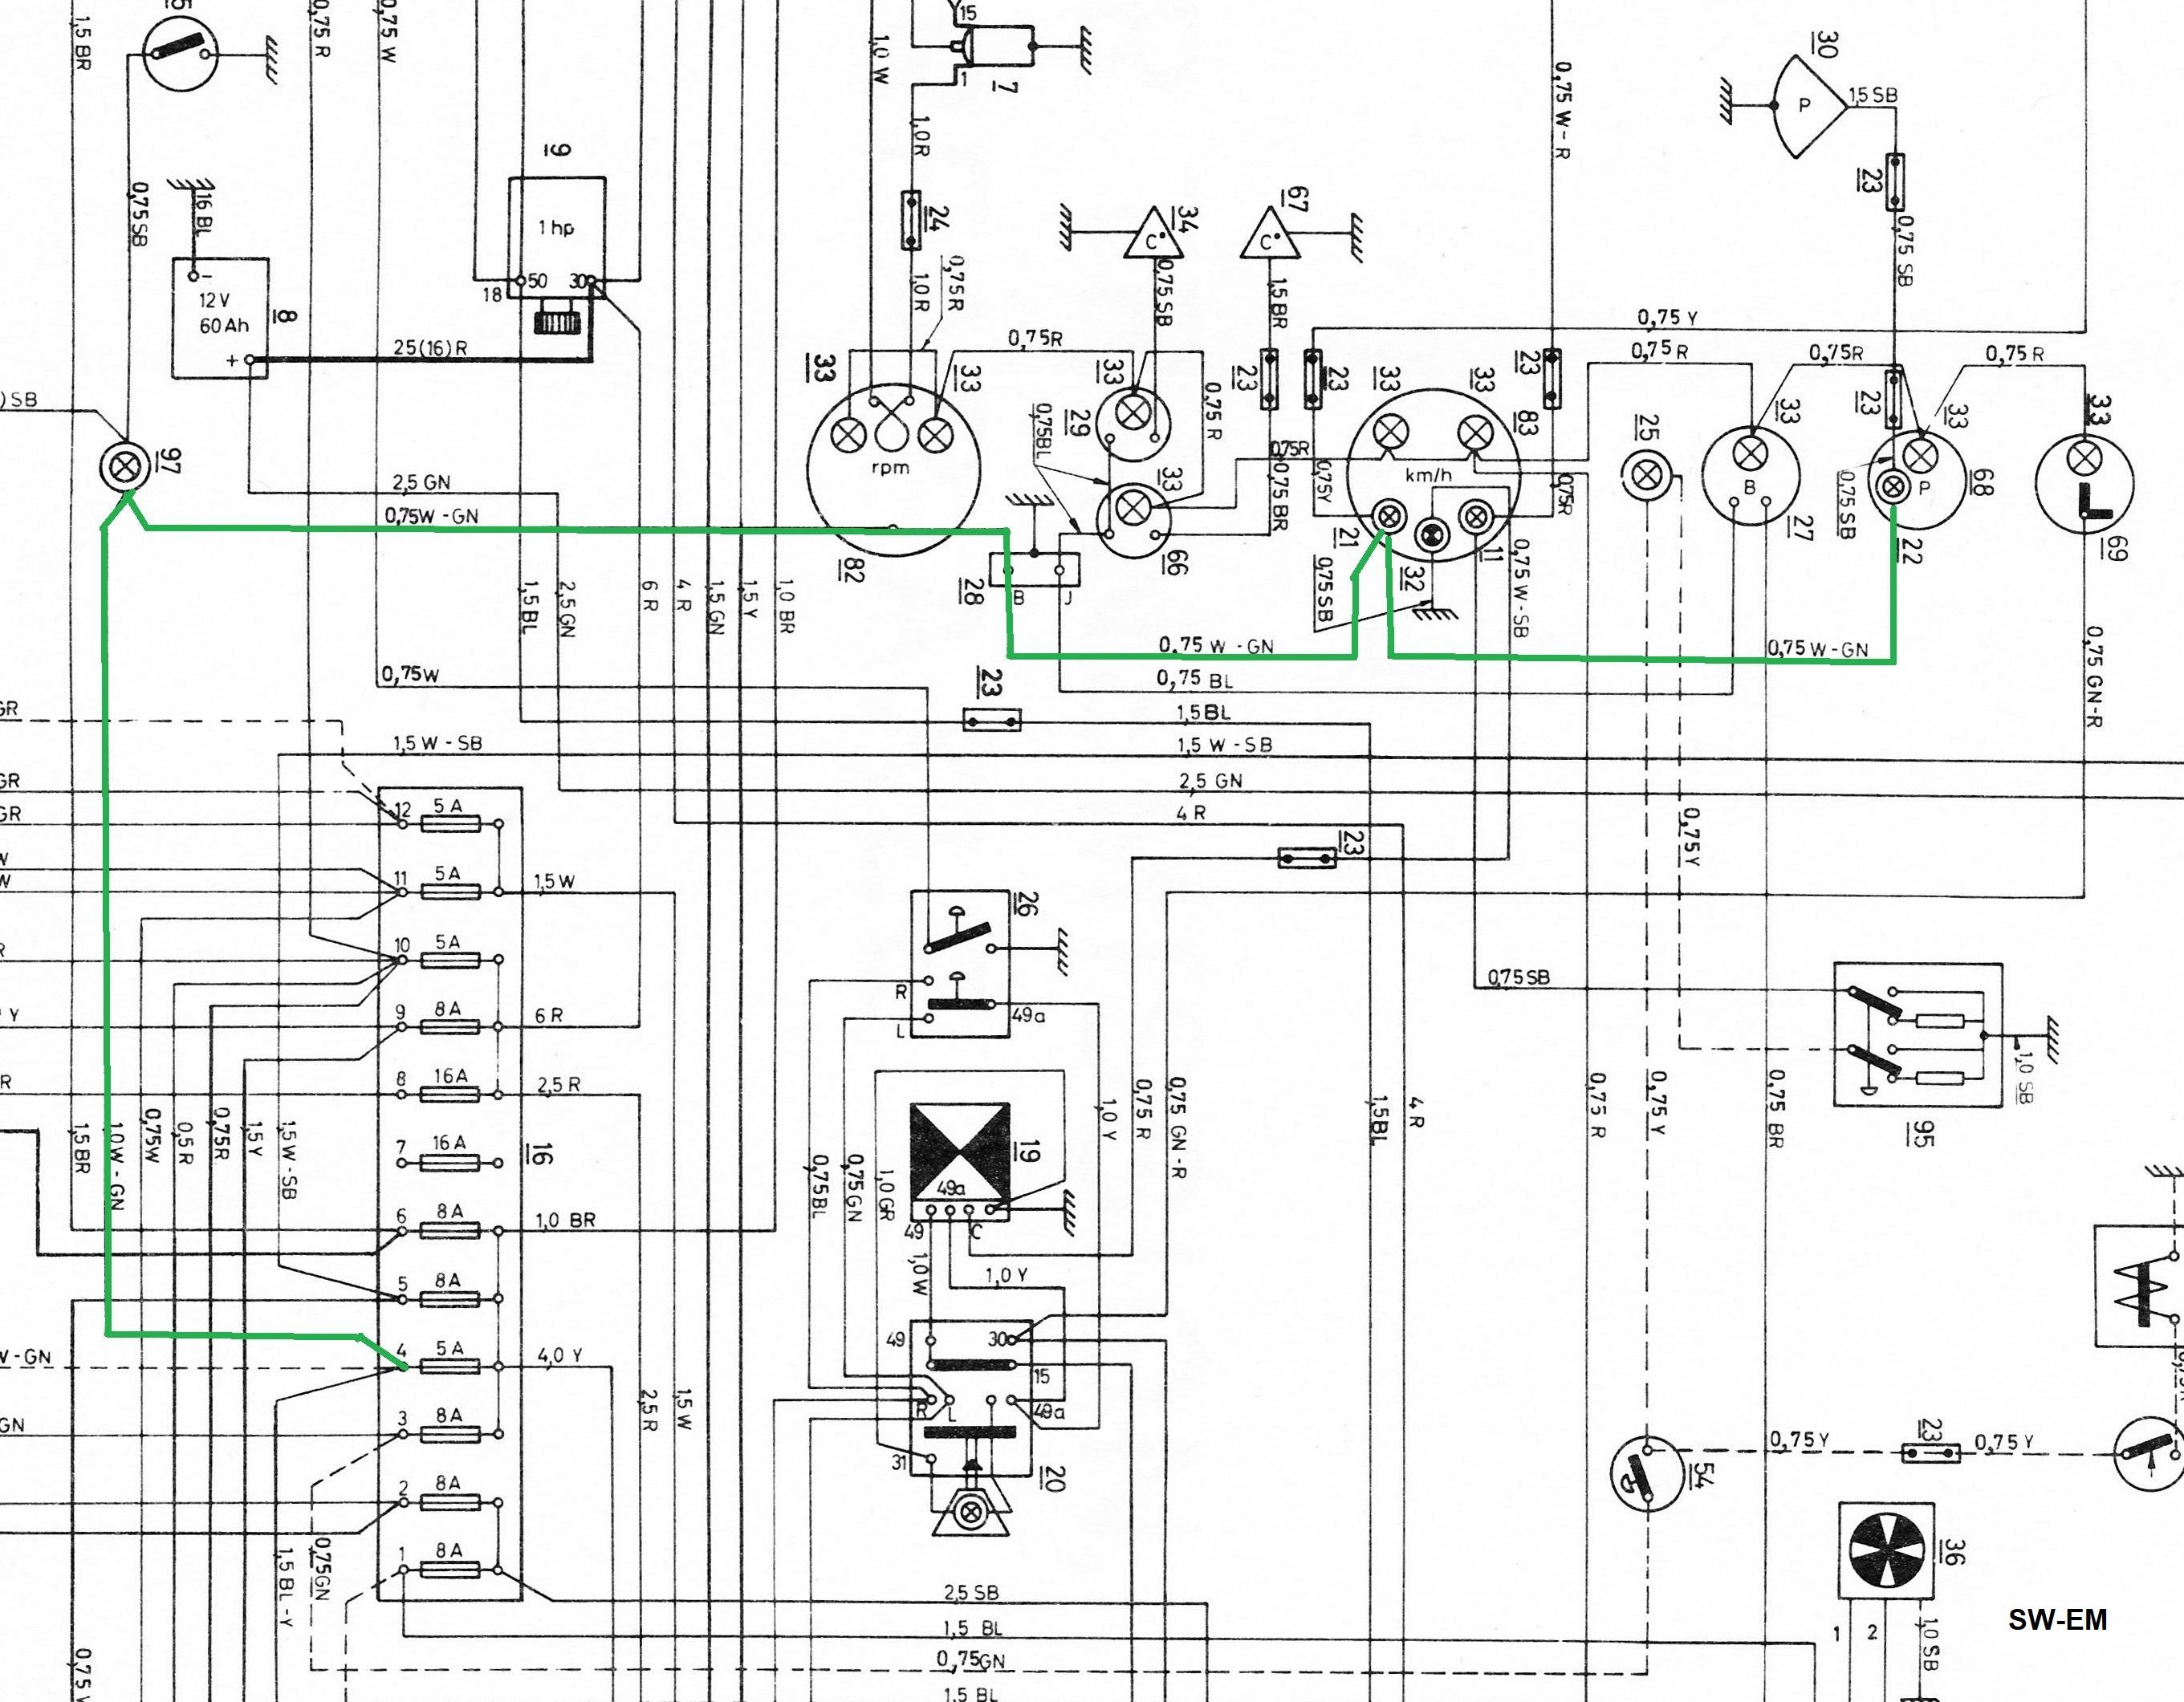 sw em service notes motorola tachometer wiring diagram